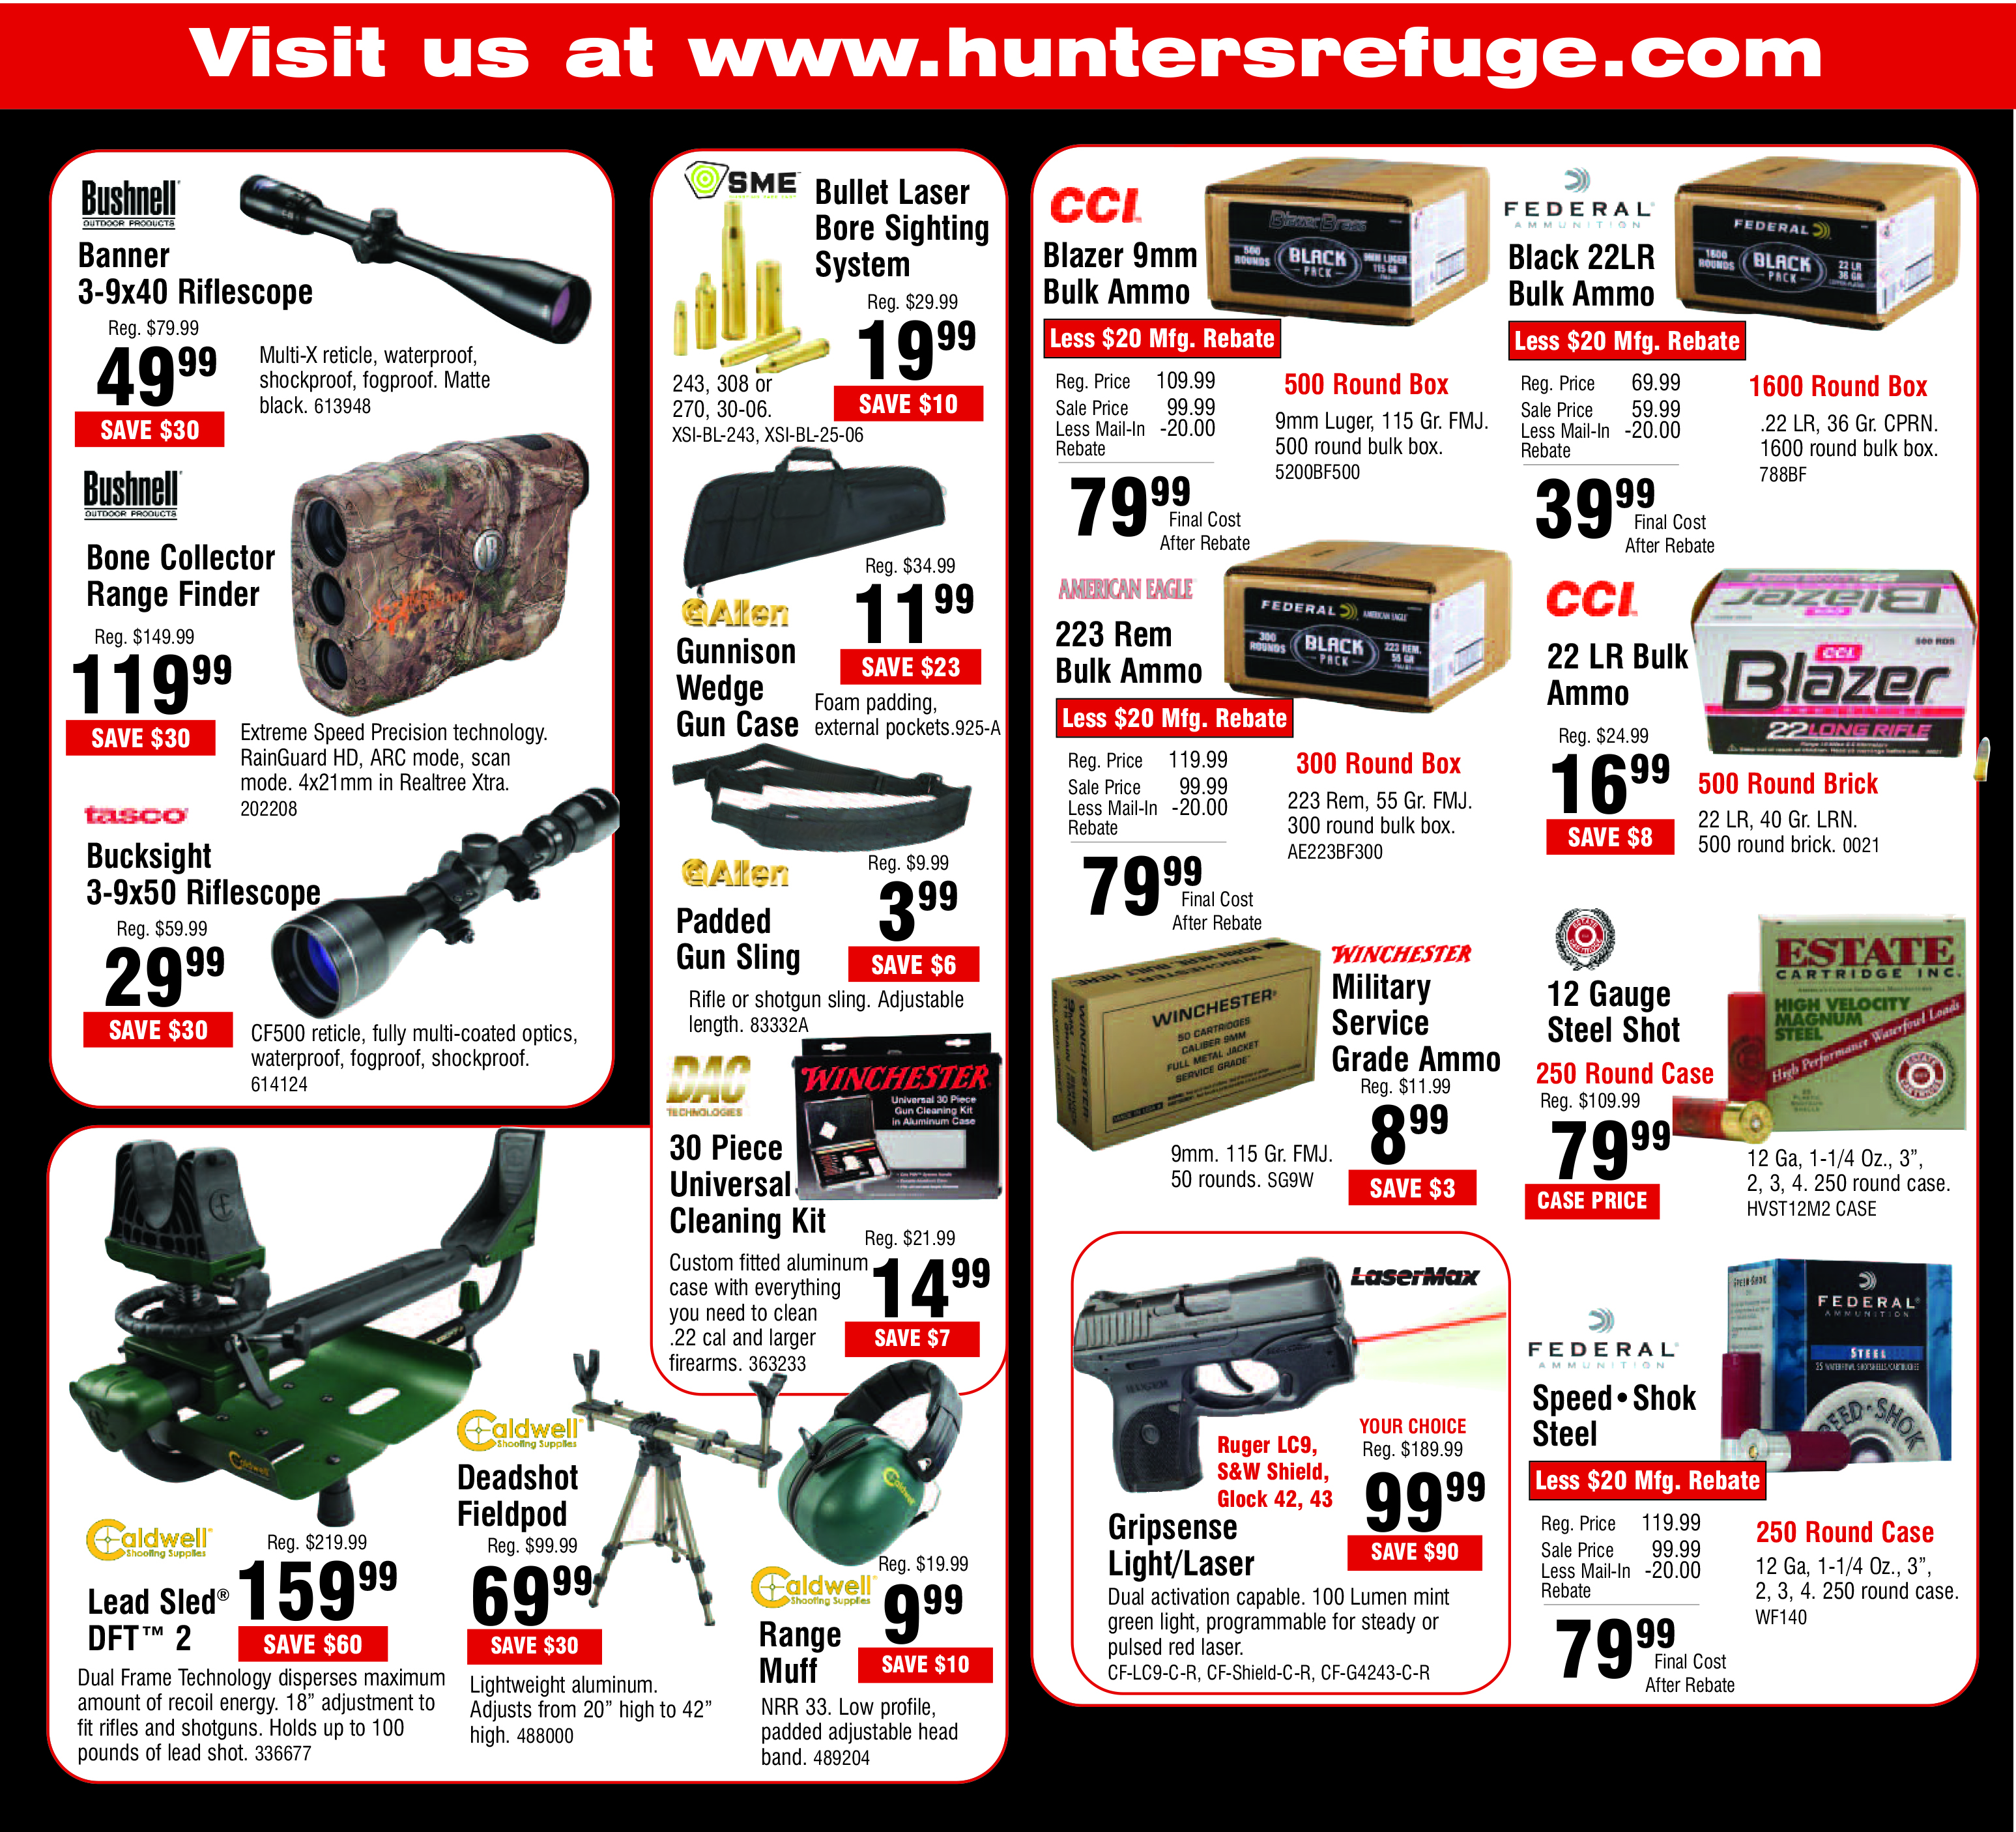 hunters-refuge-holiday-2018-4.jpg